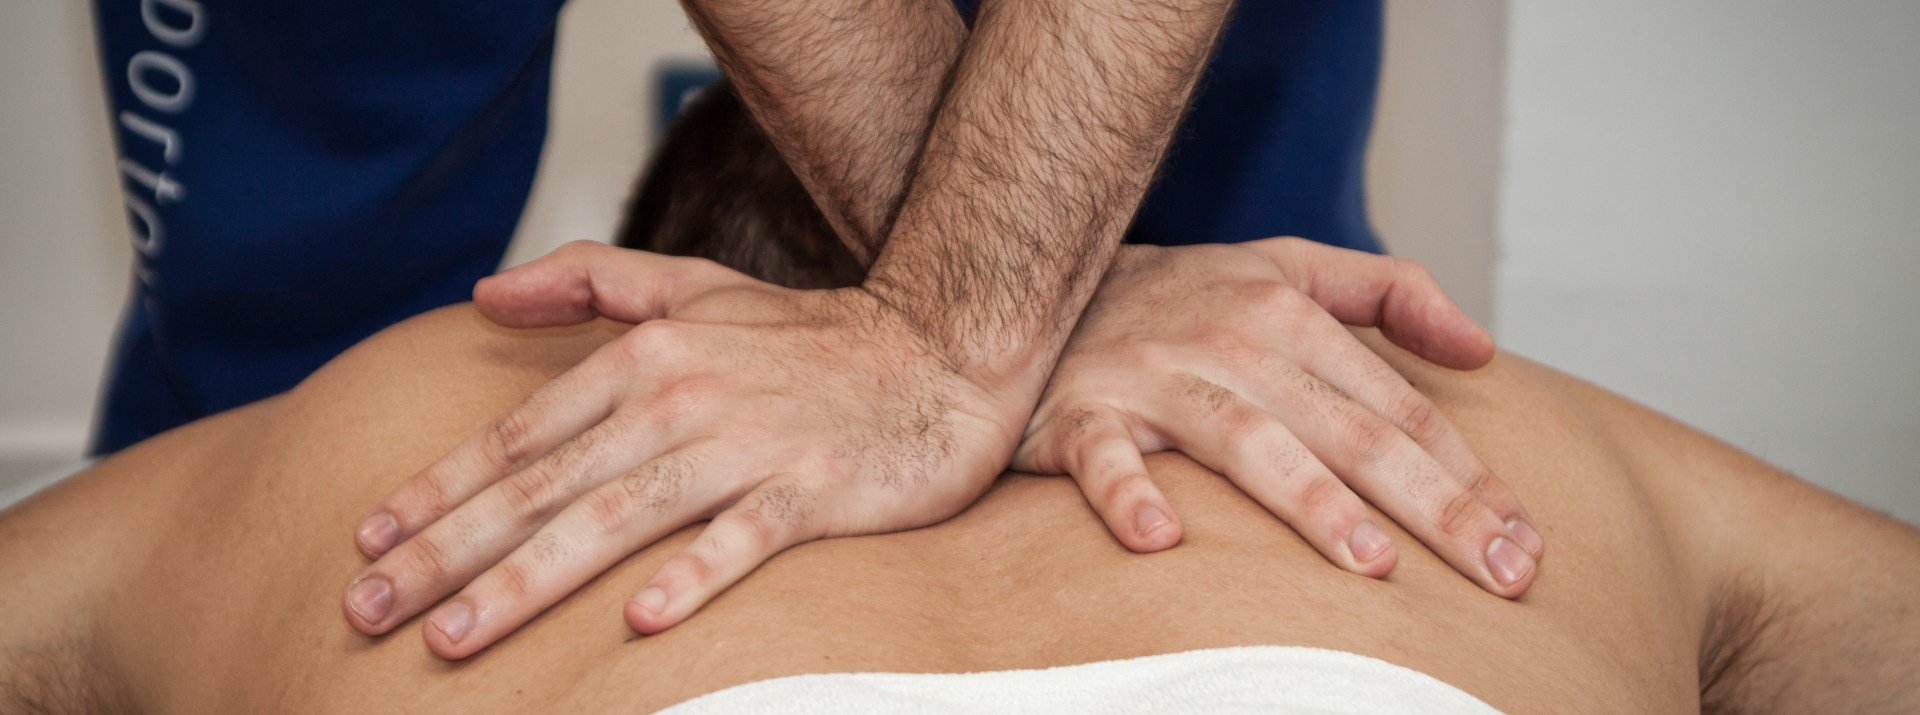 Manipulación dorsal